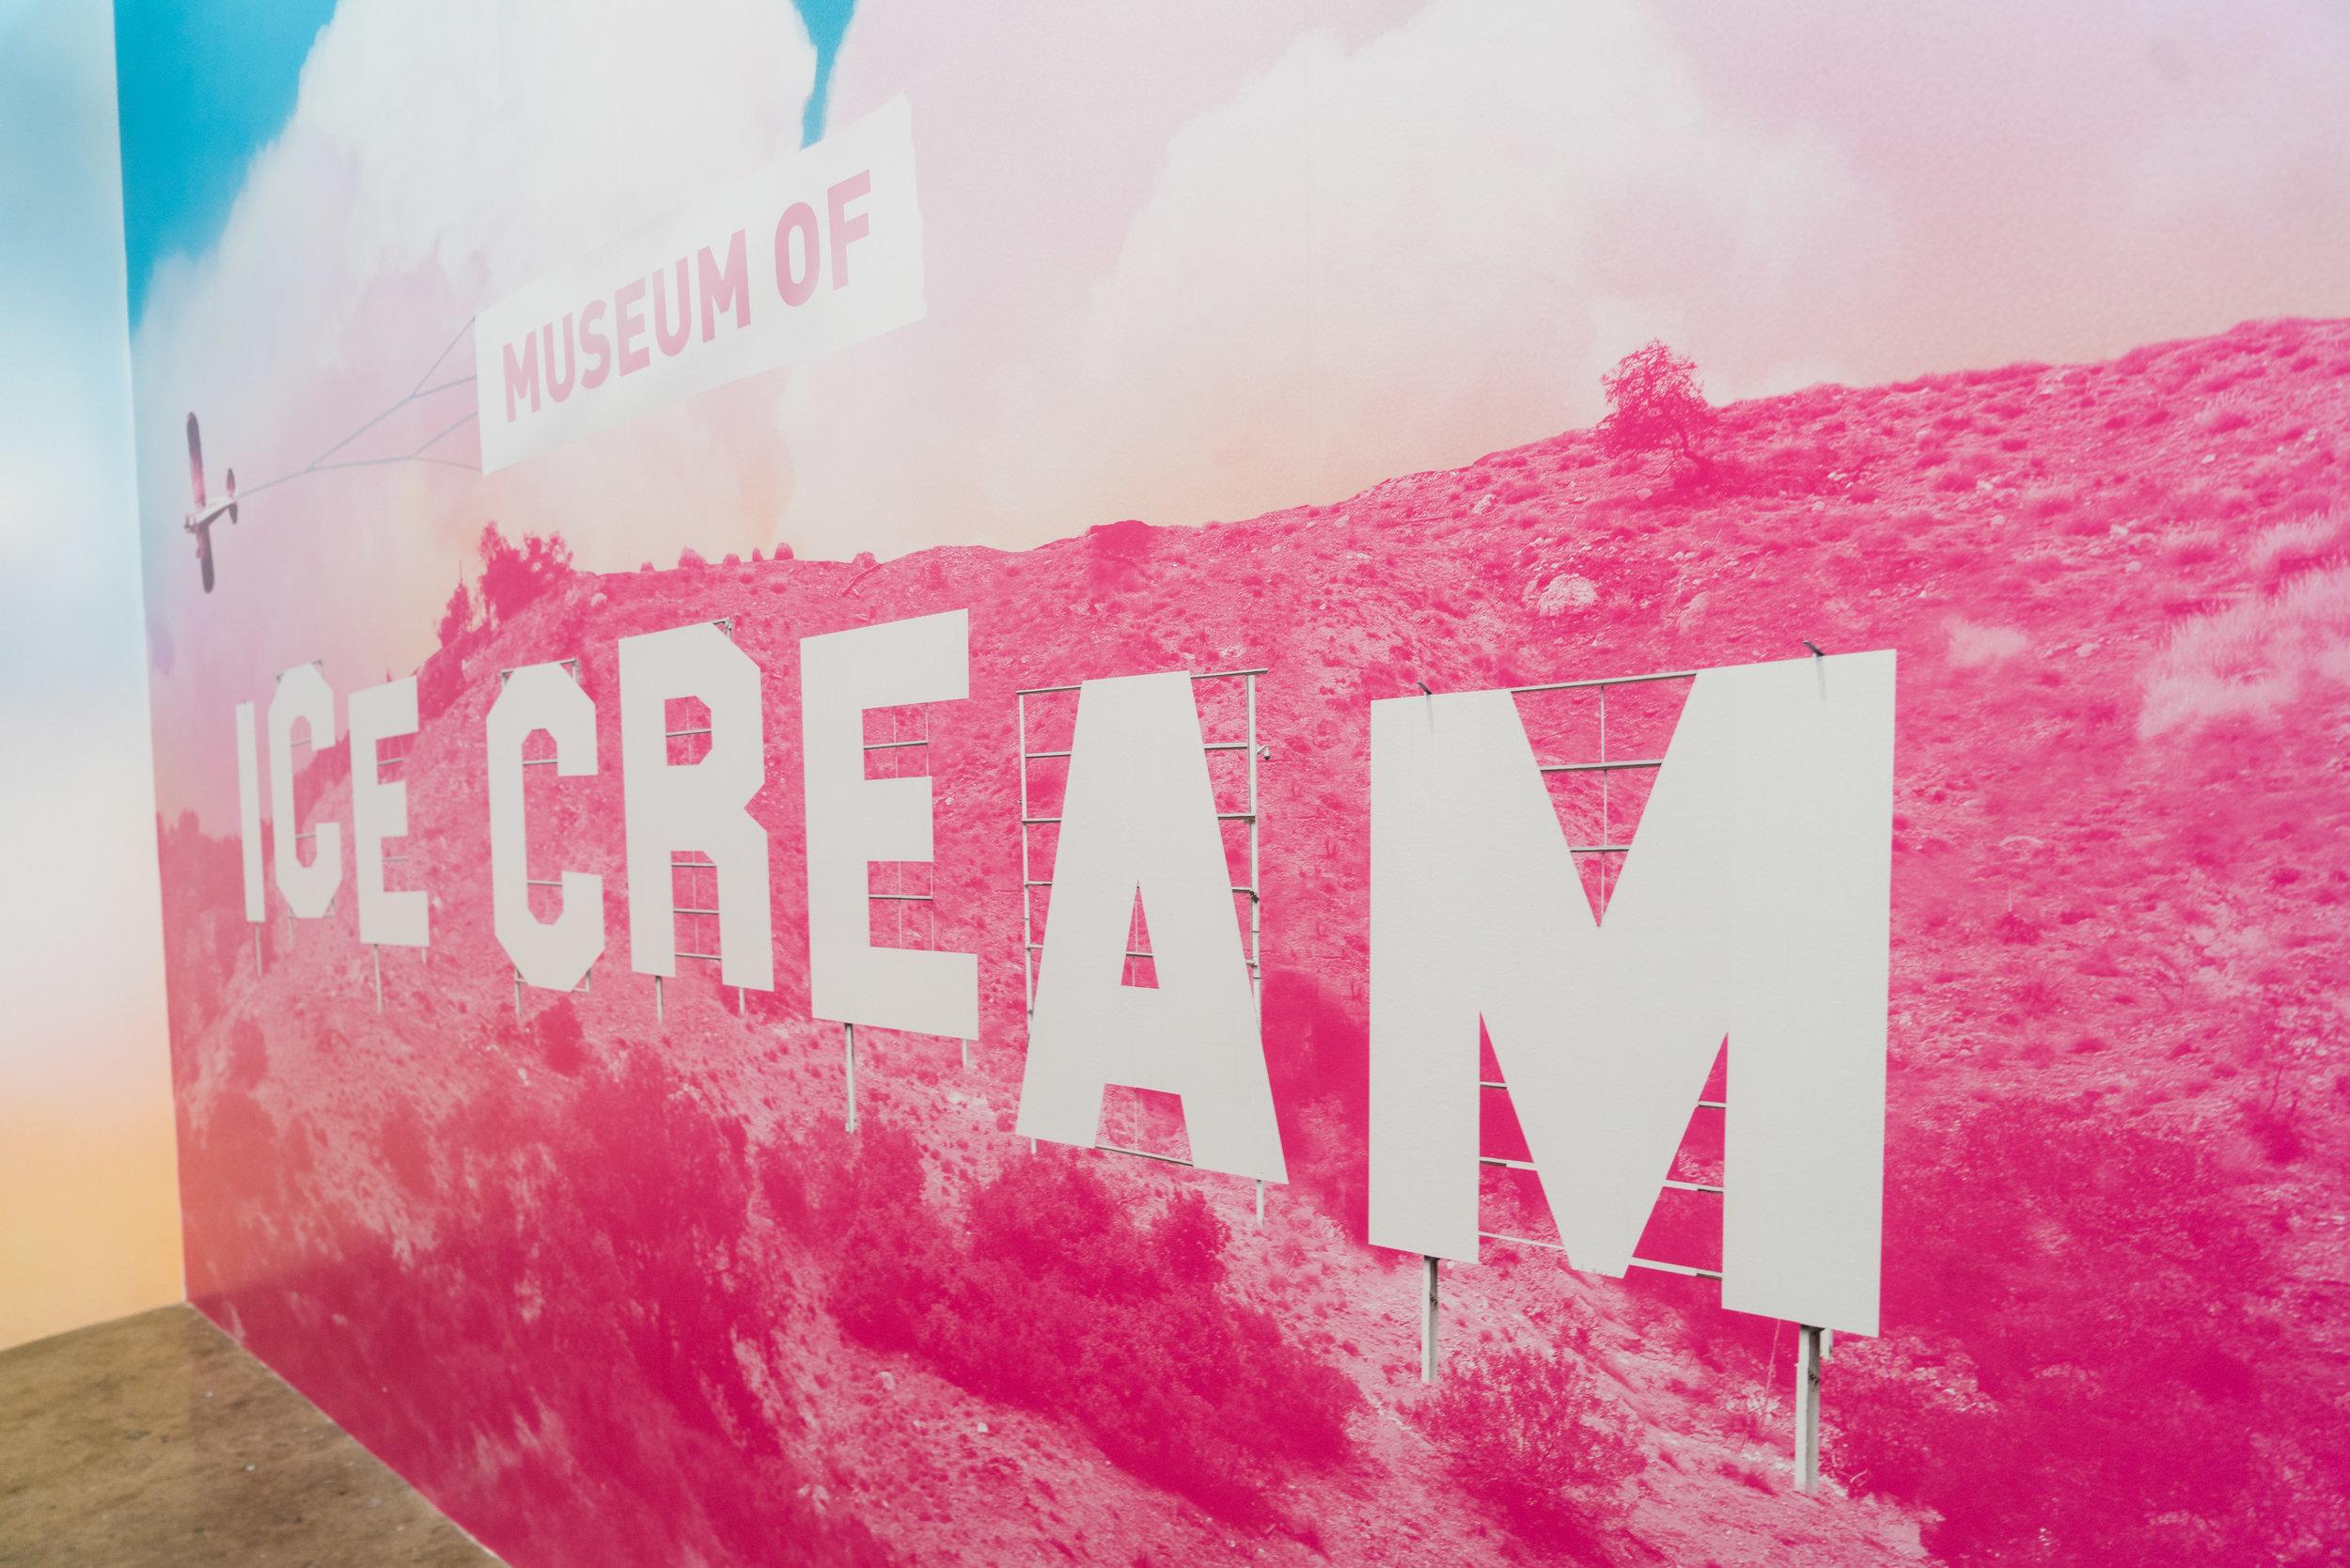 ice-cream-031.jpg